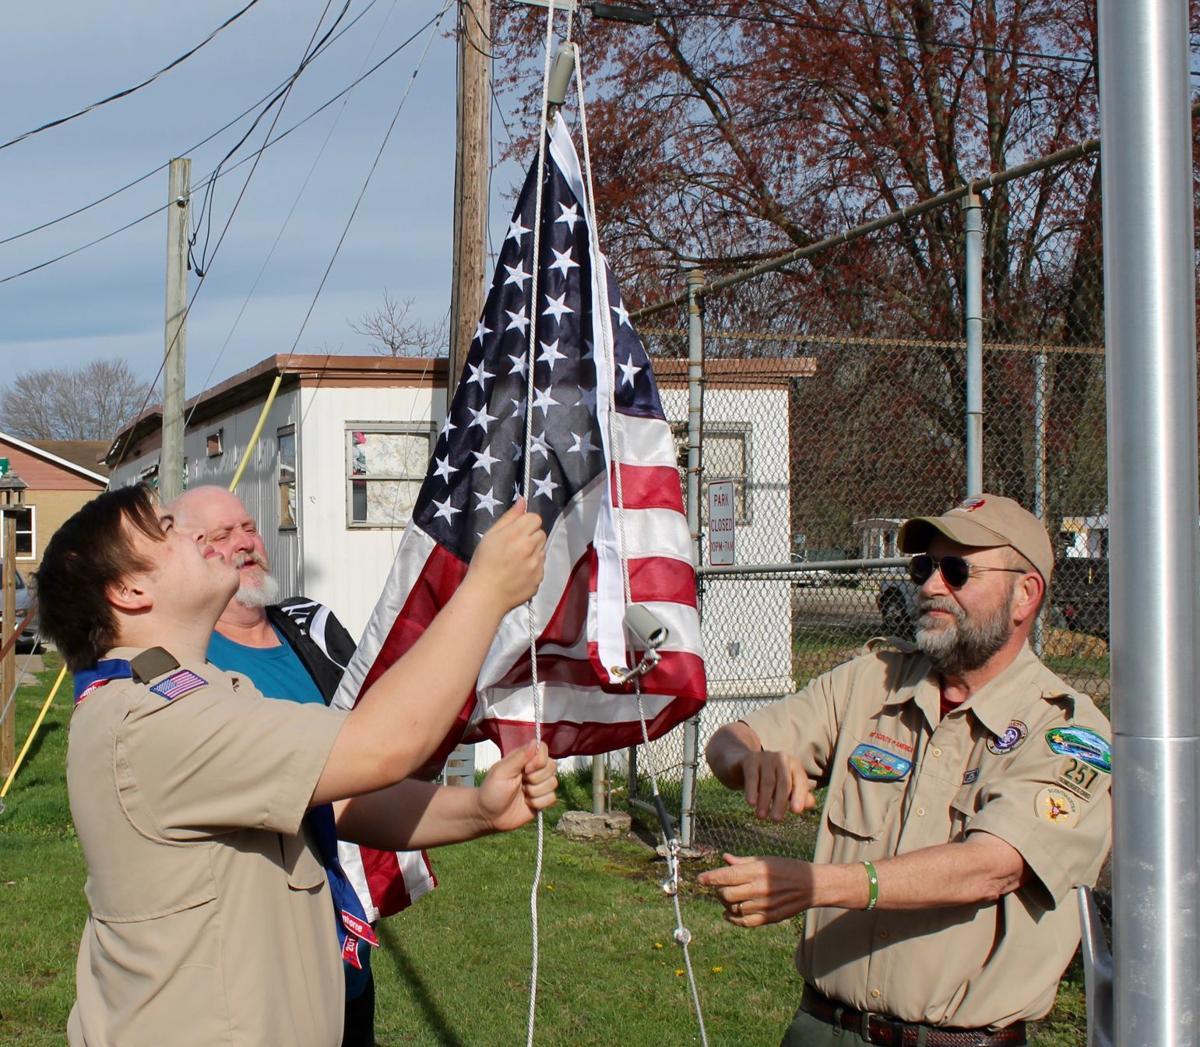 Eagle Scout creates new site for U.S. flag